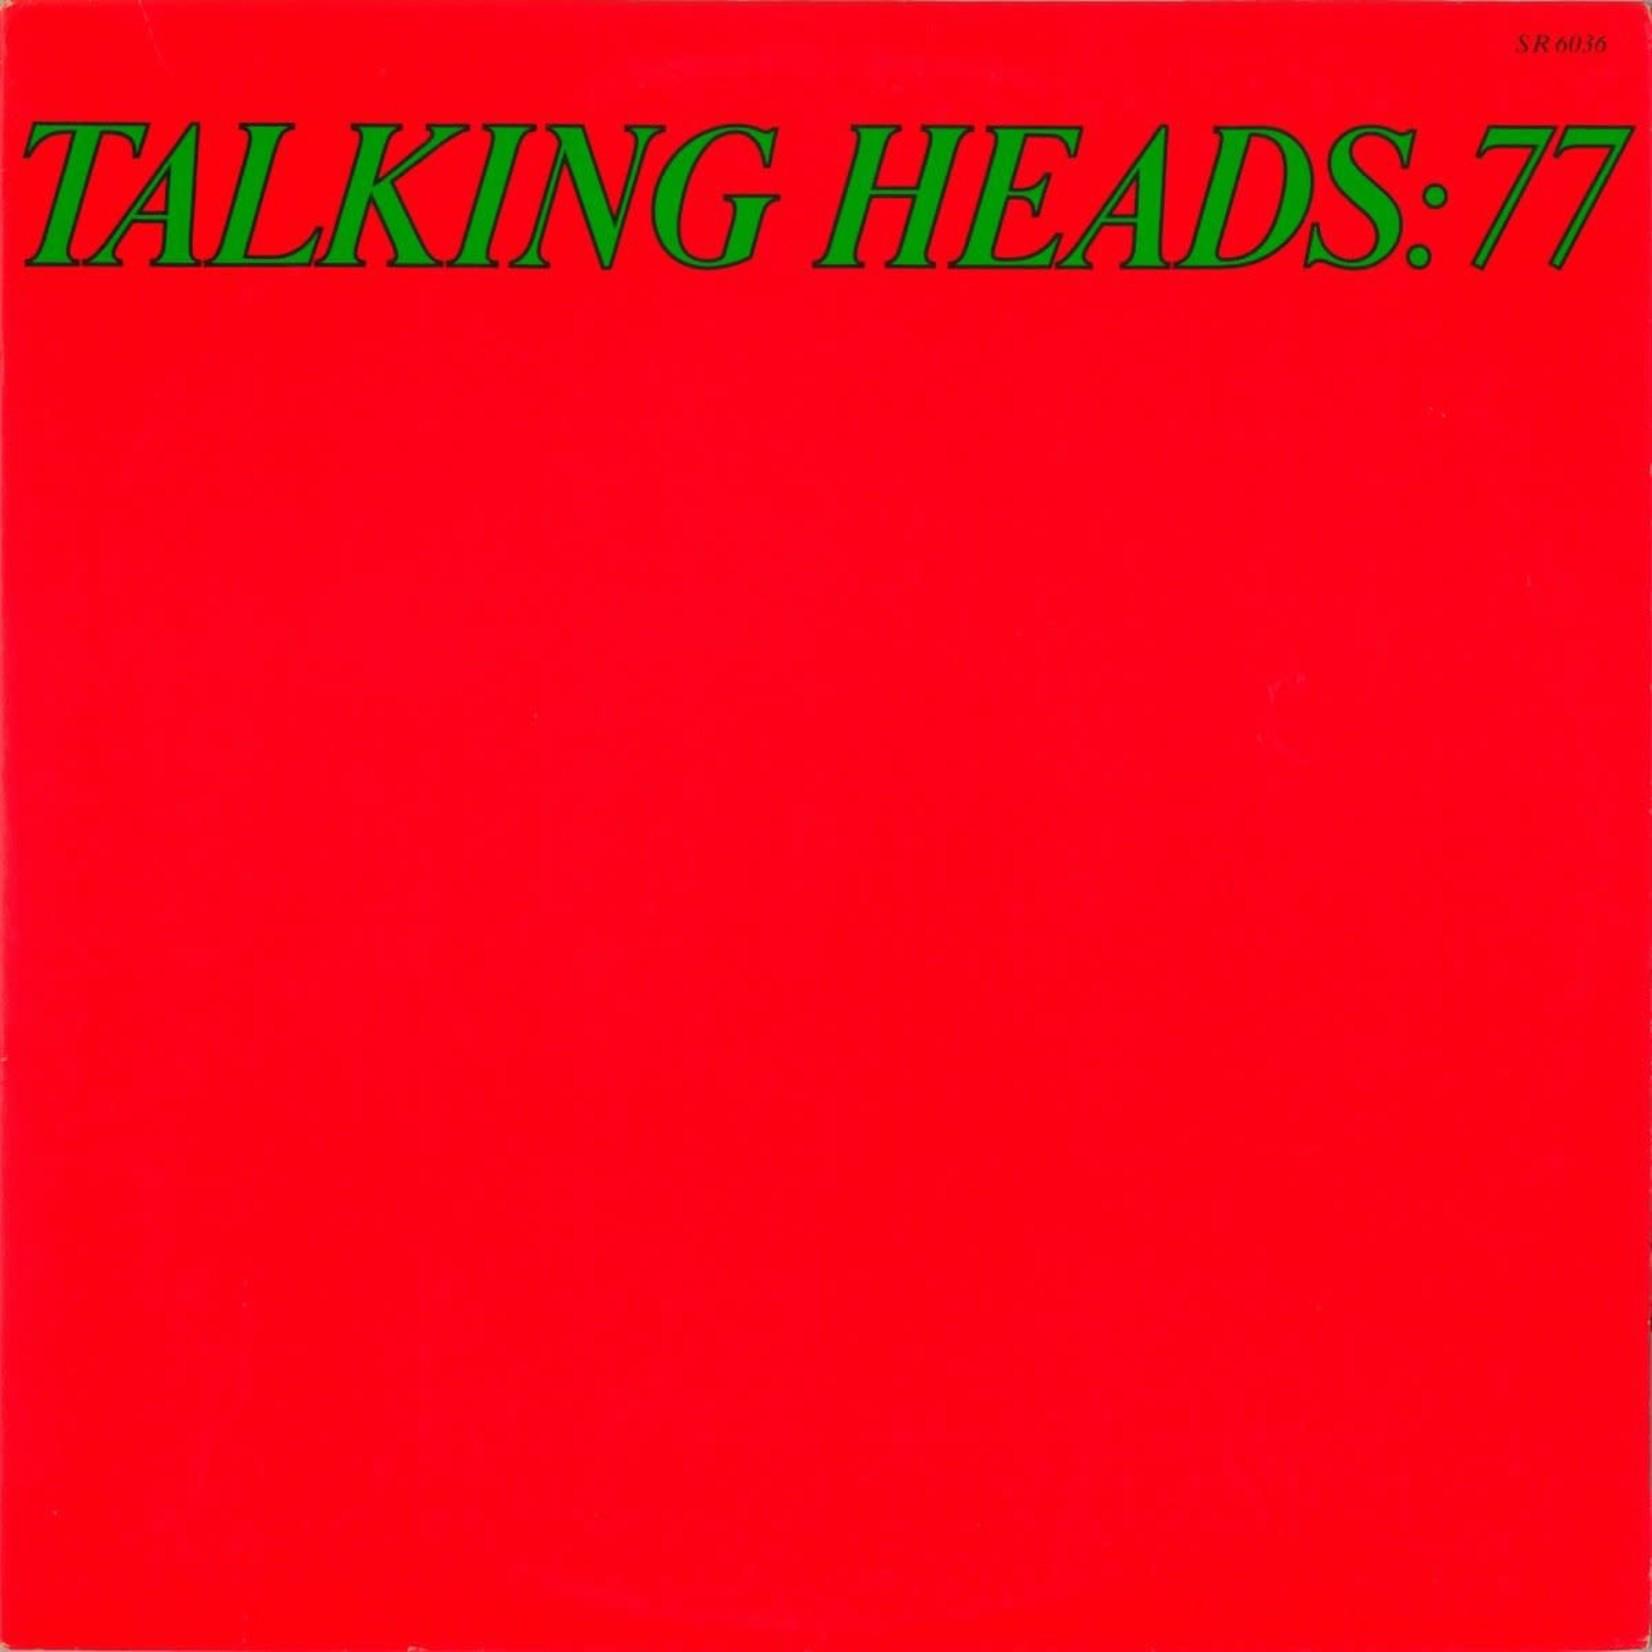 [Vintage] Talking Heads: 77 (70s press)